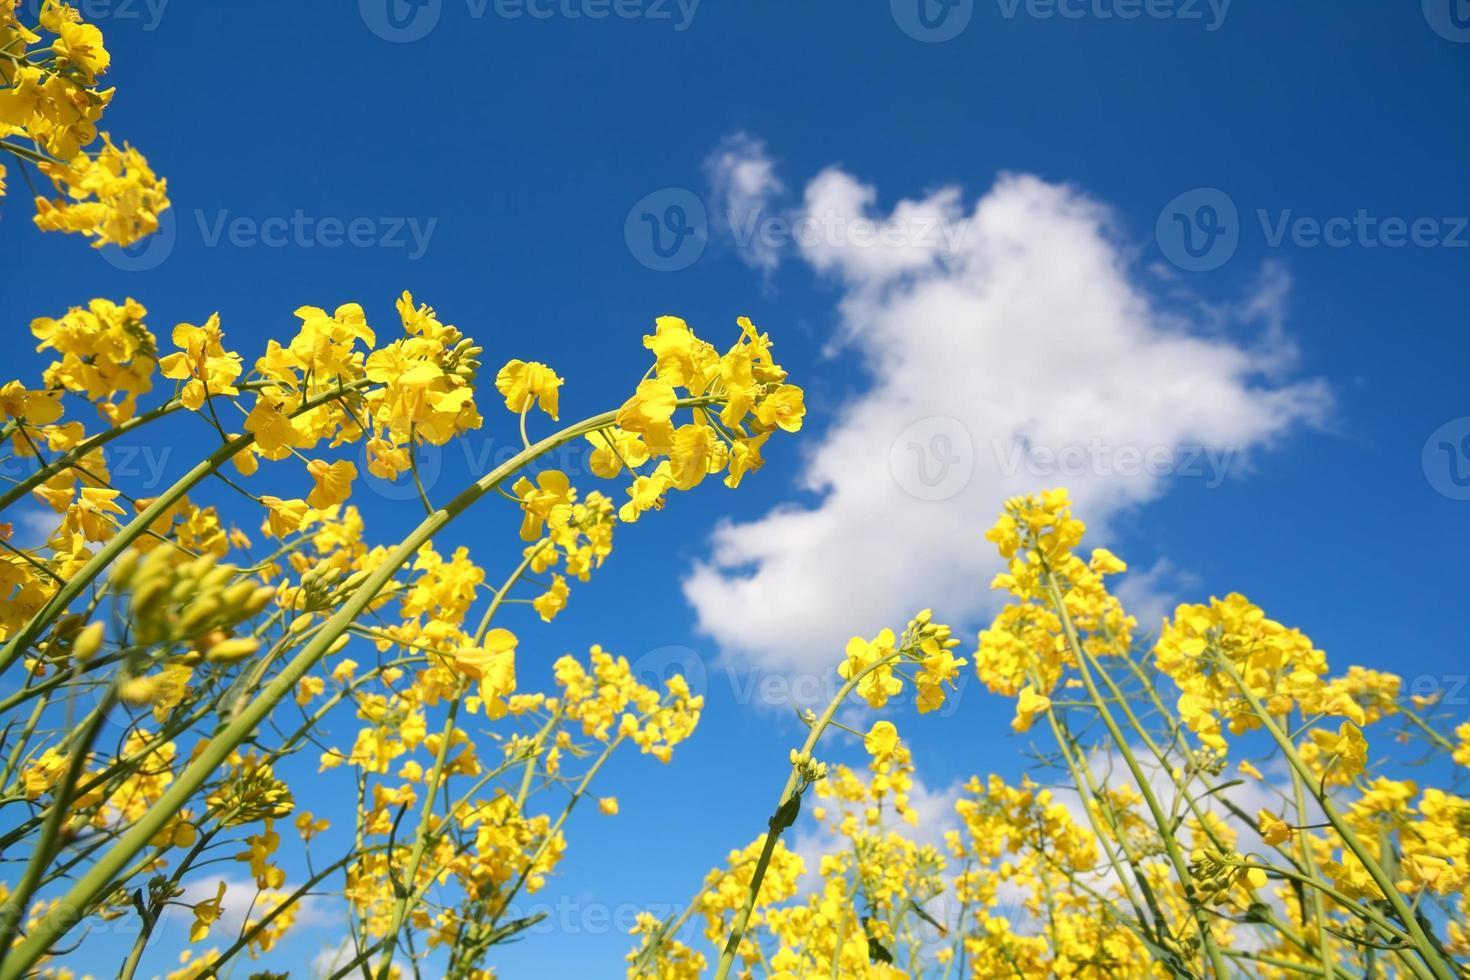 rapsblommor och blå himmel foto